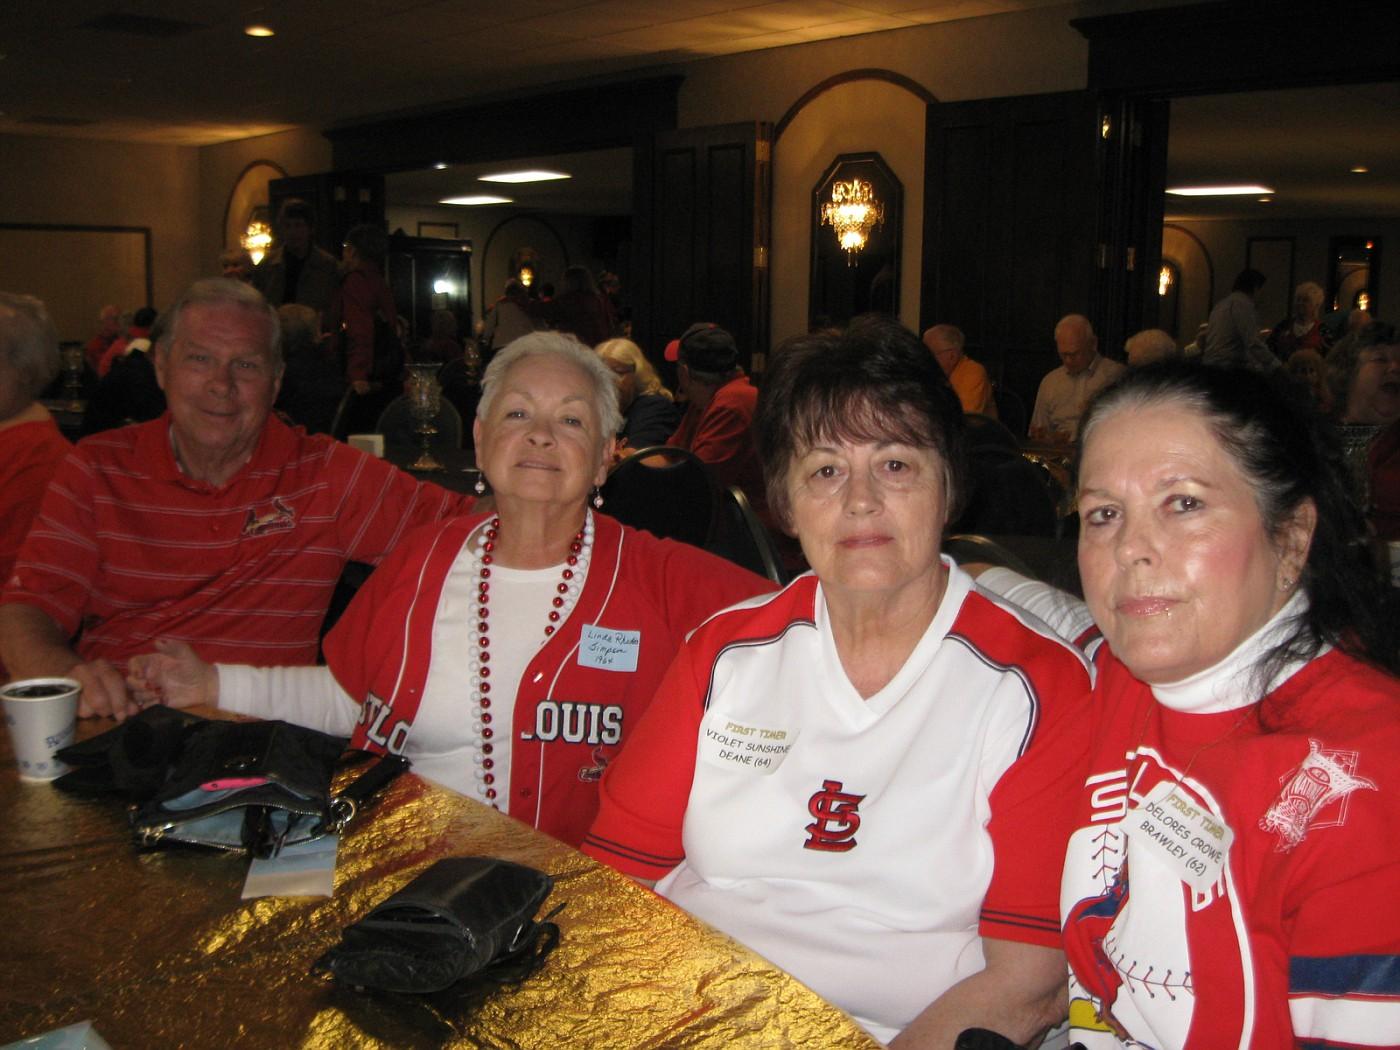 Kenney and Linda Simpson, Vi Deane, Delores Brawley